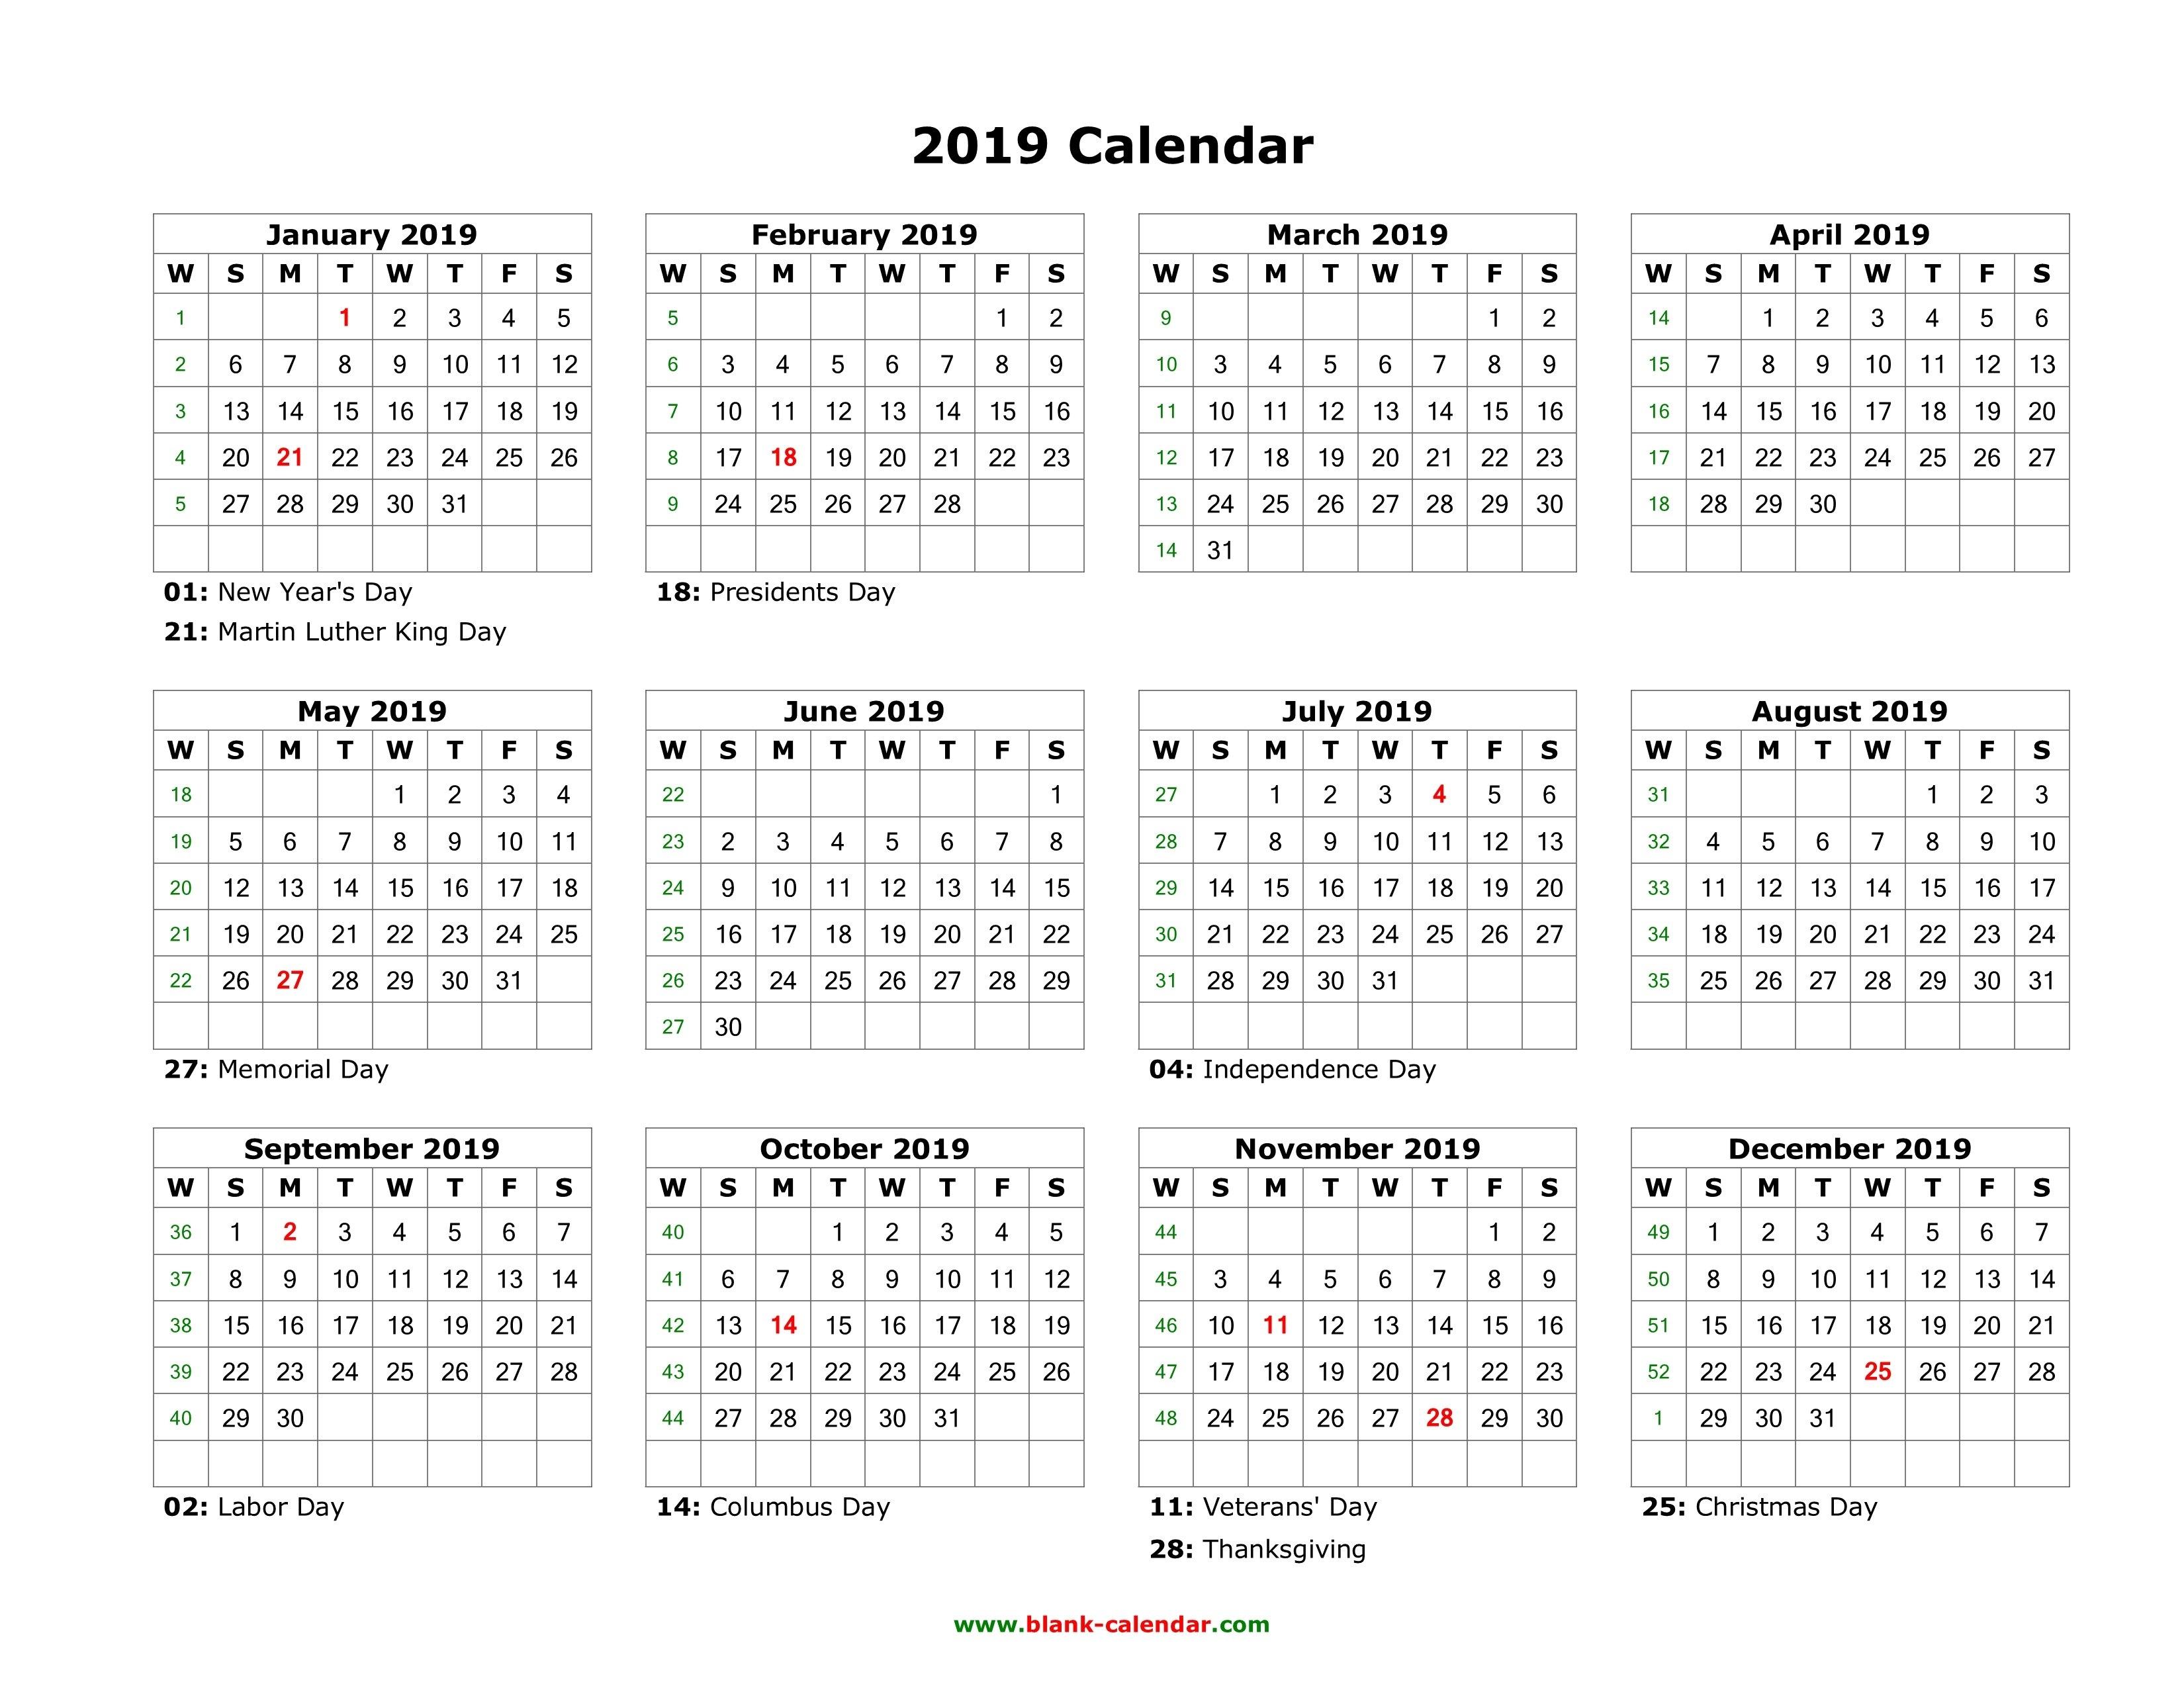 Blank Calendar 2019 | Free Download Calendar Templates Calendar 2019 Editable Word